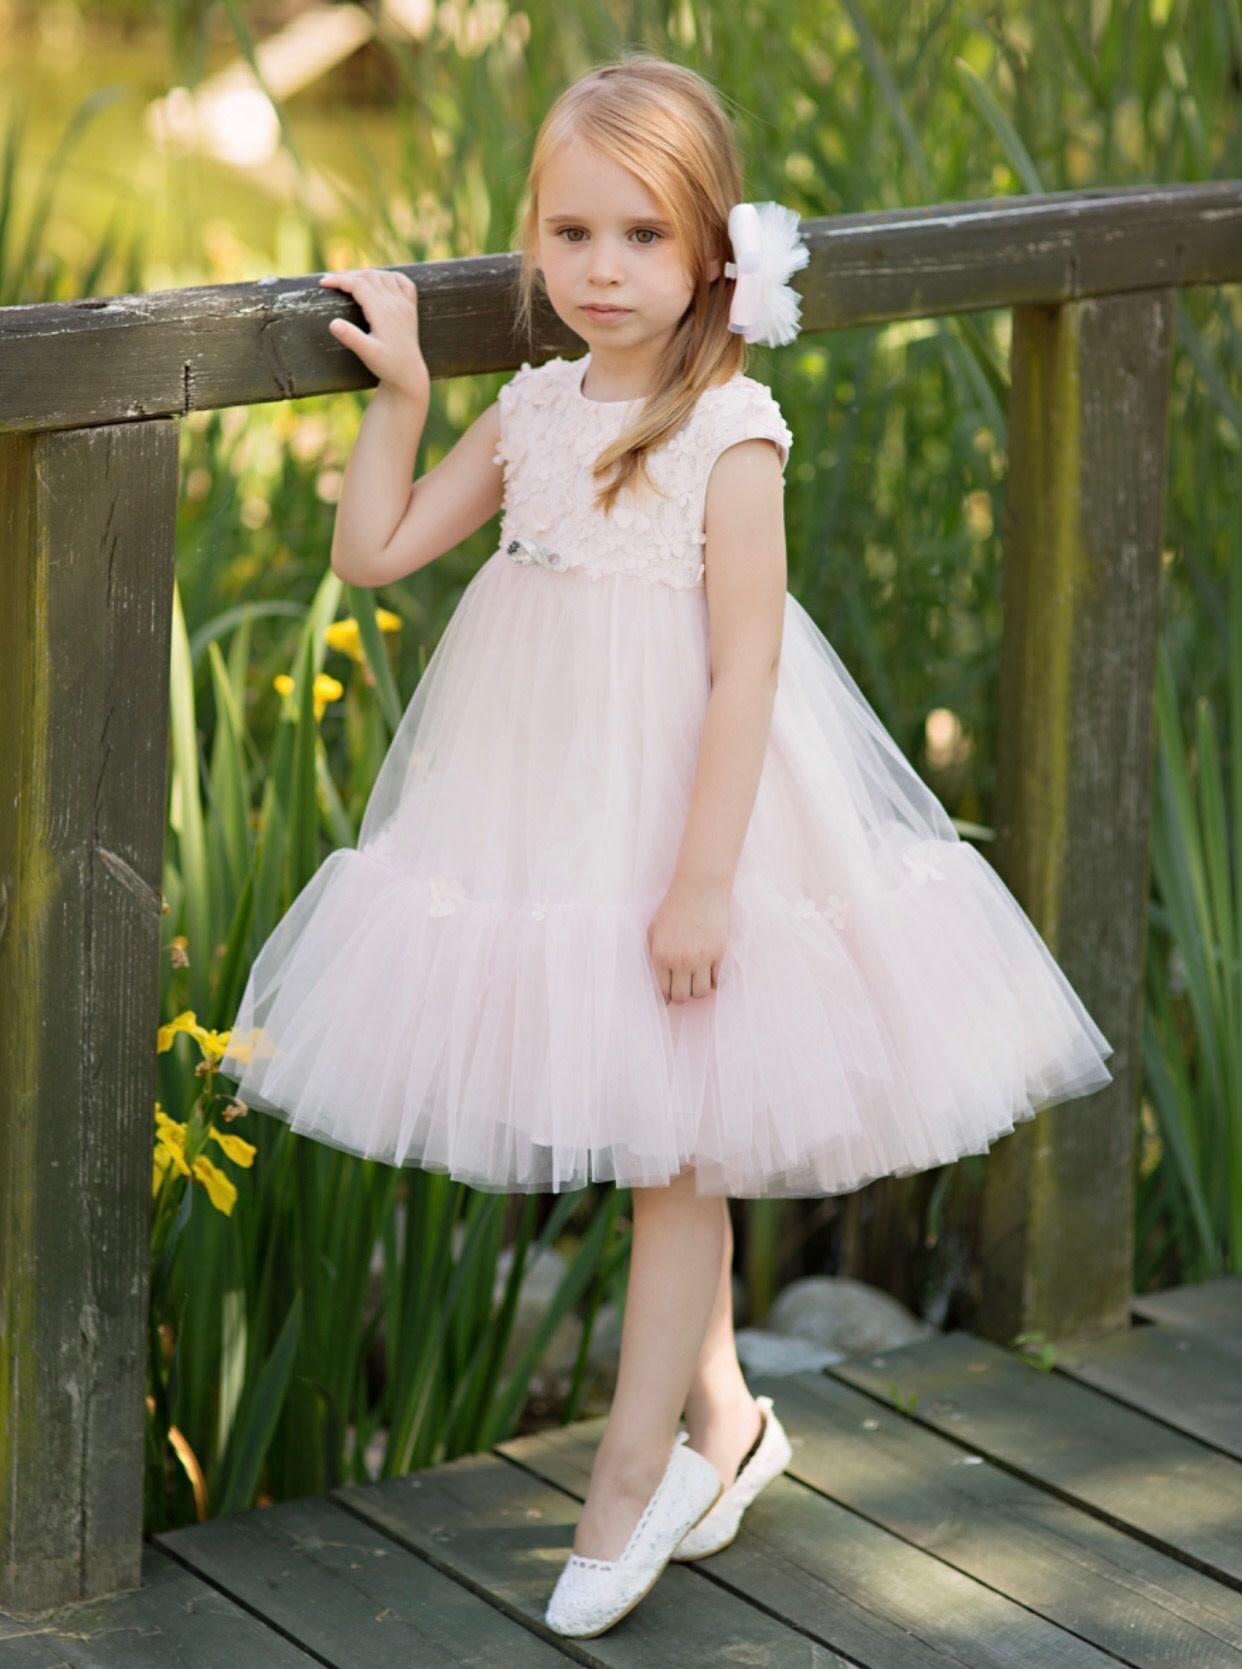 Daga Daga Pink Blossom & Tulle Dress With Silver Bow